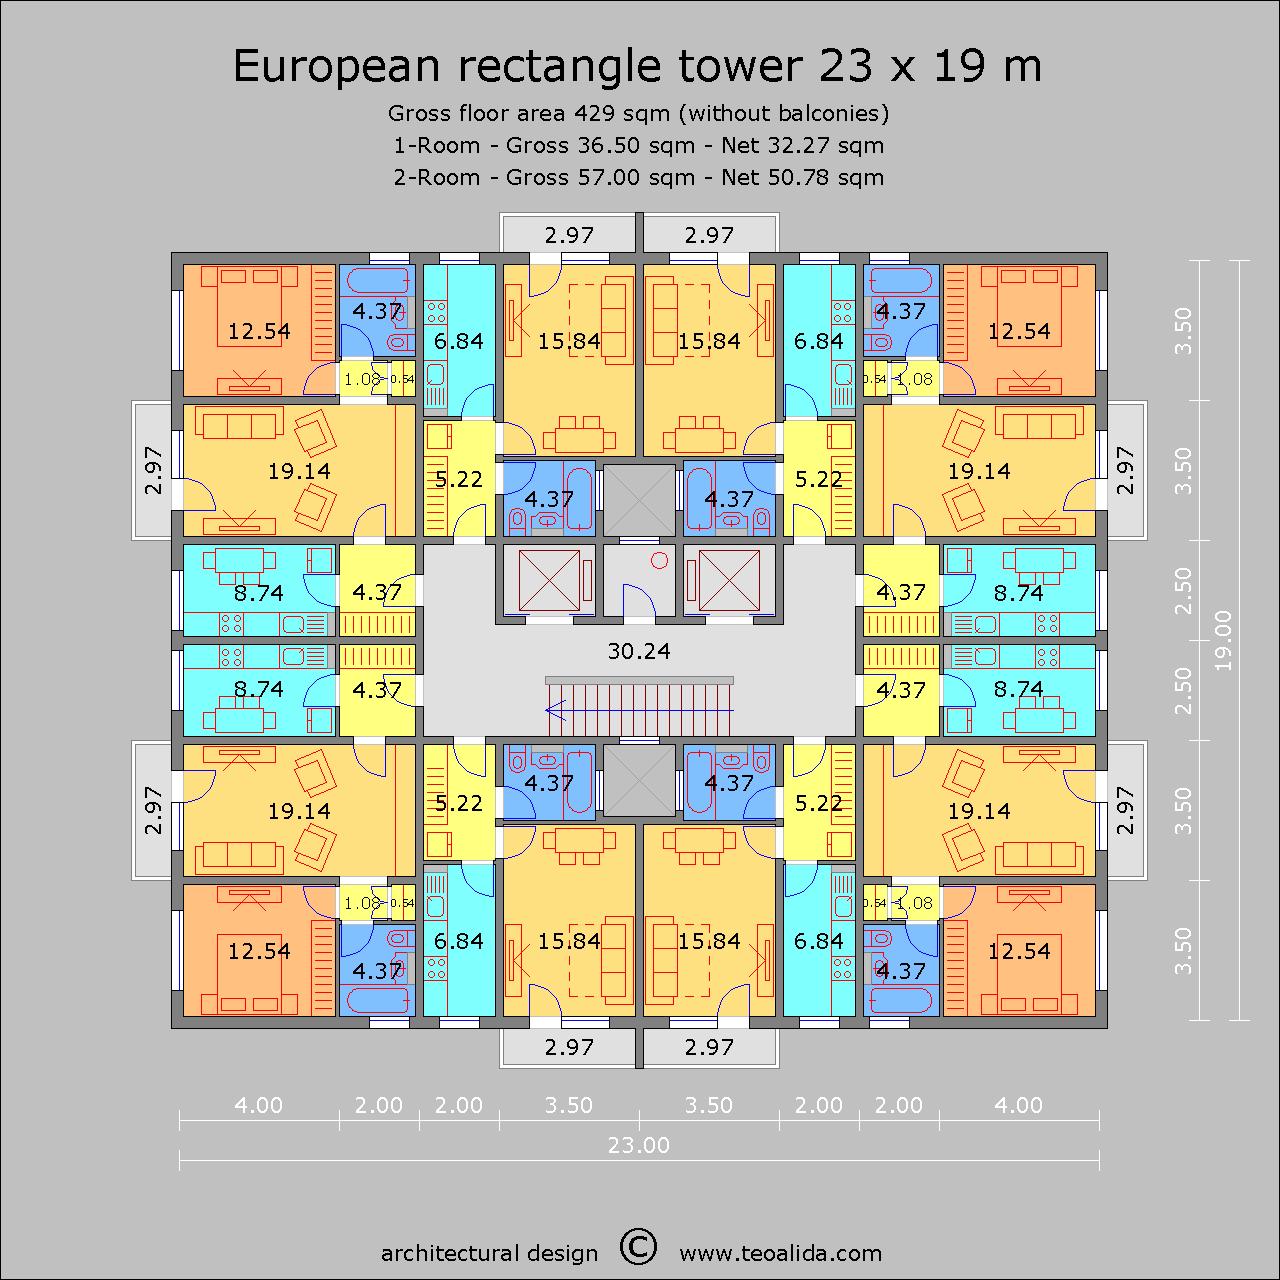 European Rectangle Tower 23 x 19 m